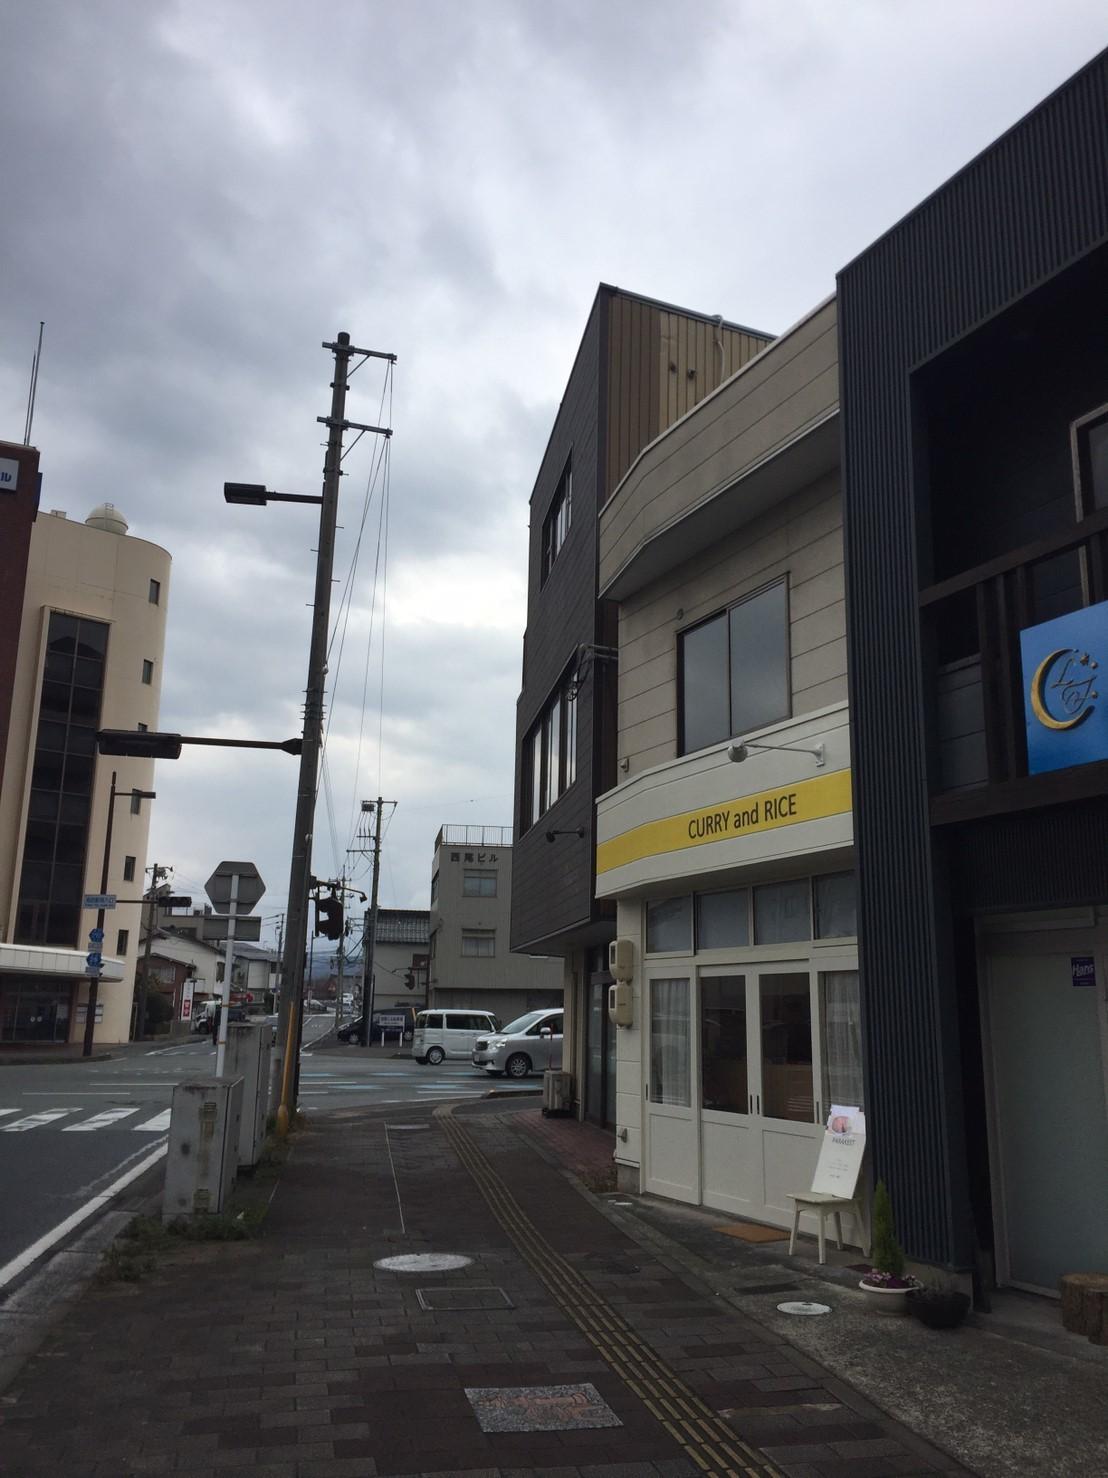 PARAKEET 限定カレー (金沢カレー風 ポークカツカレー)_e0115904_12203346.jpg